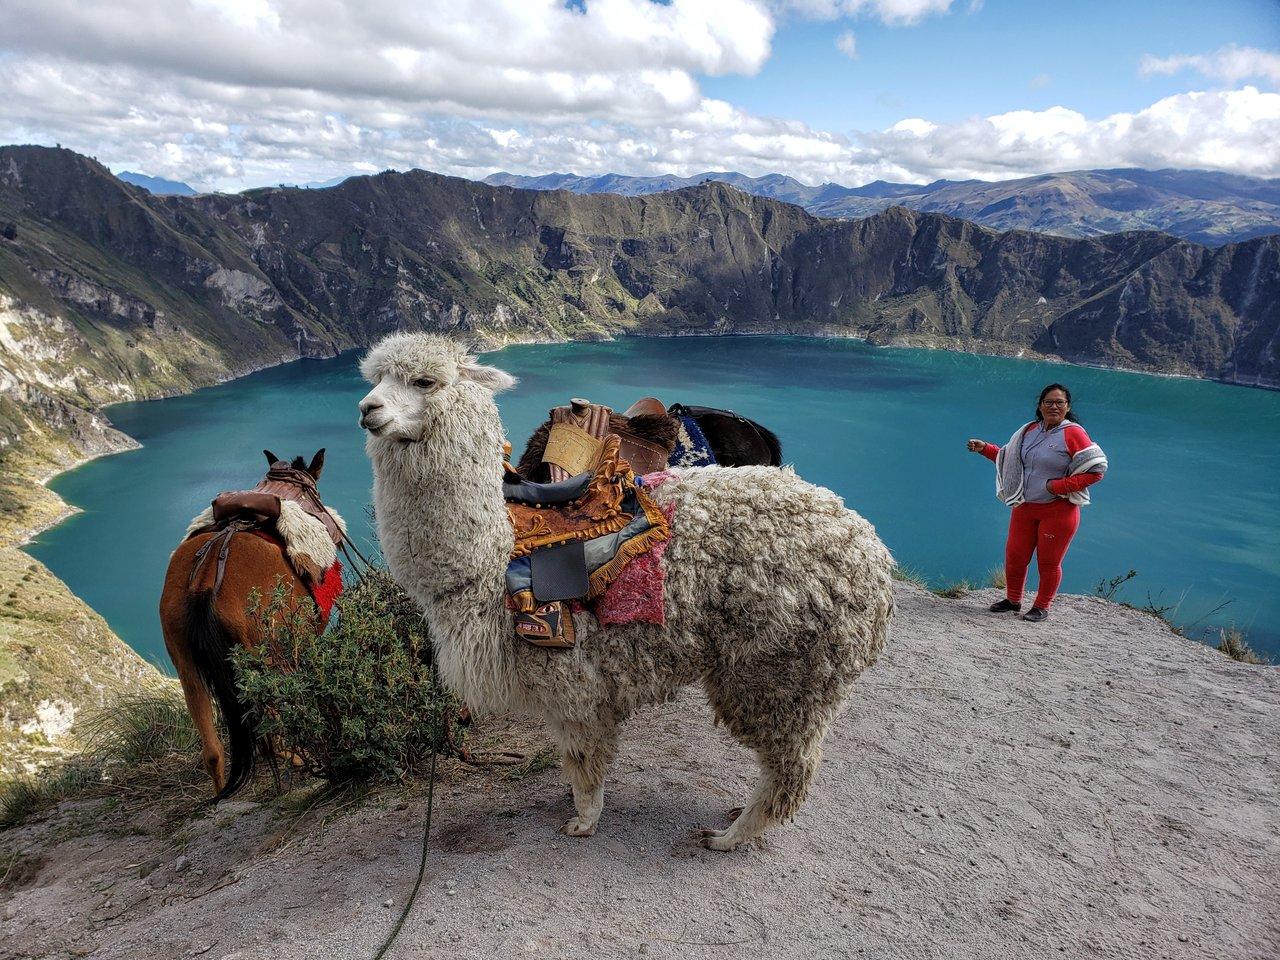 Quintessential Ecuadorian mountain scene | Photo taken by Peter S